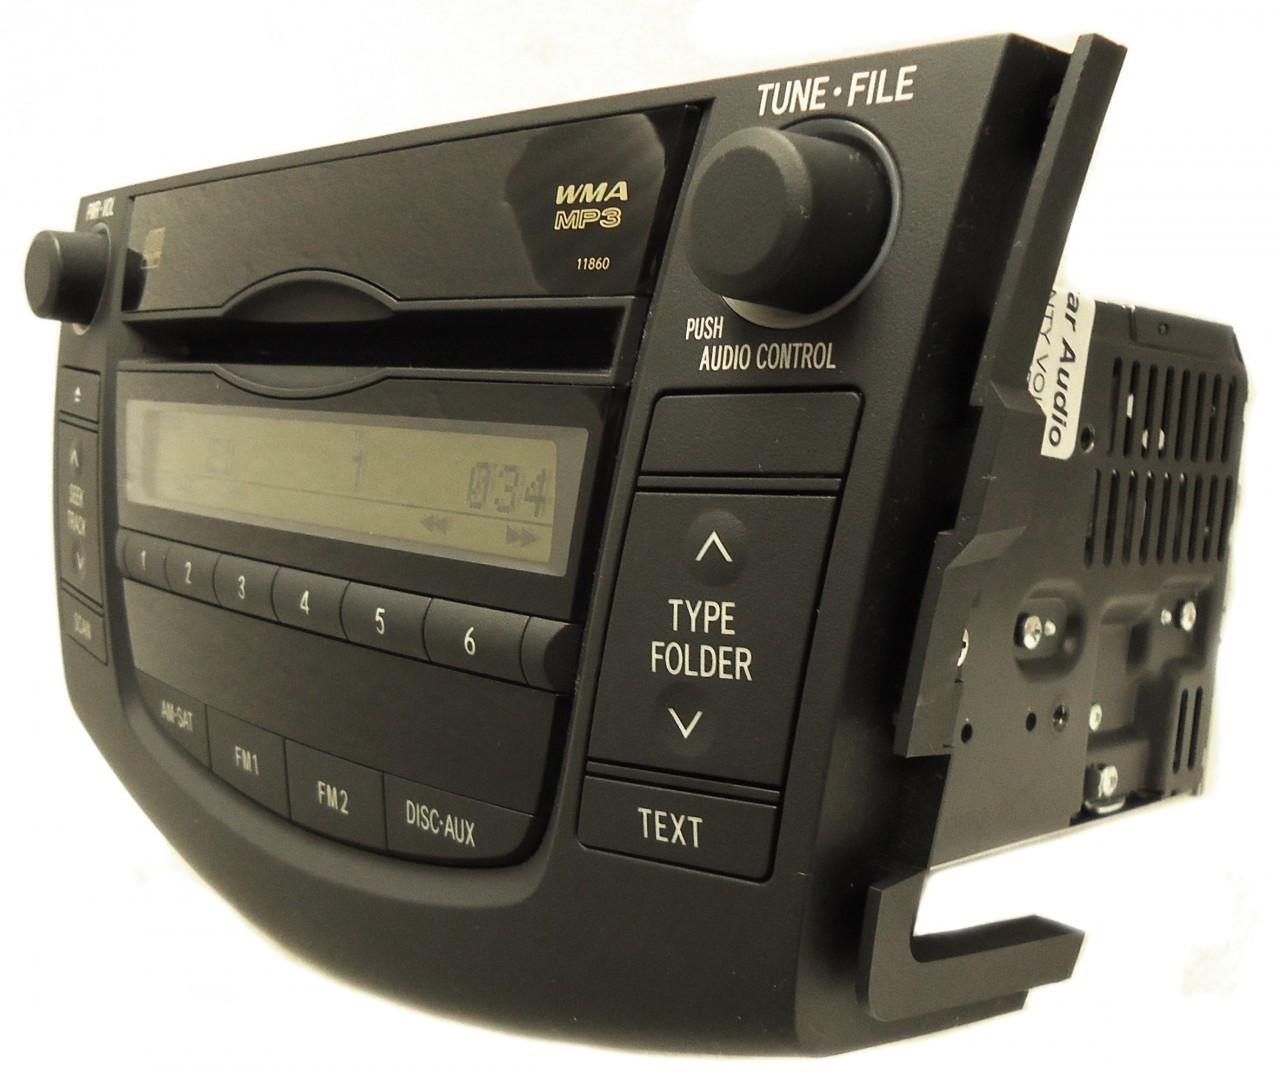 06 07 08 10 2011 Toyota Rav4 Satellite Radio Stereo Mp3 Player